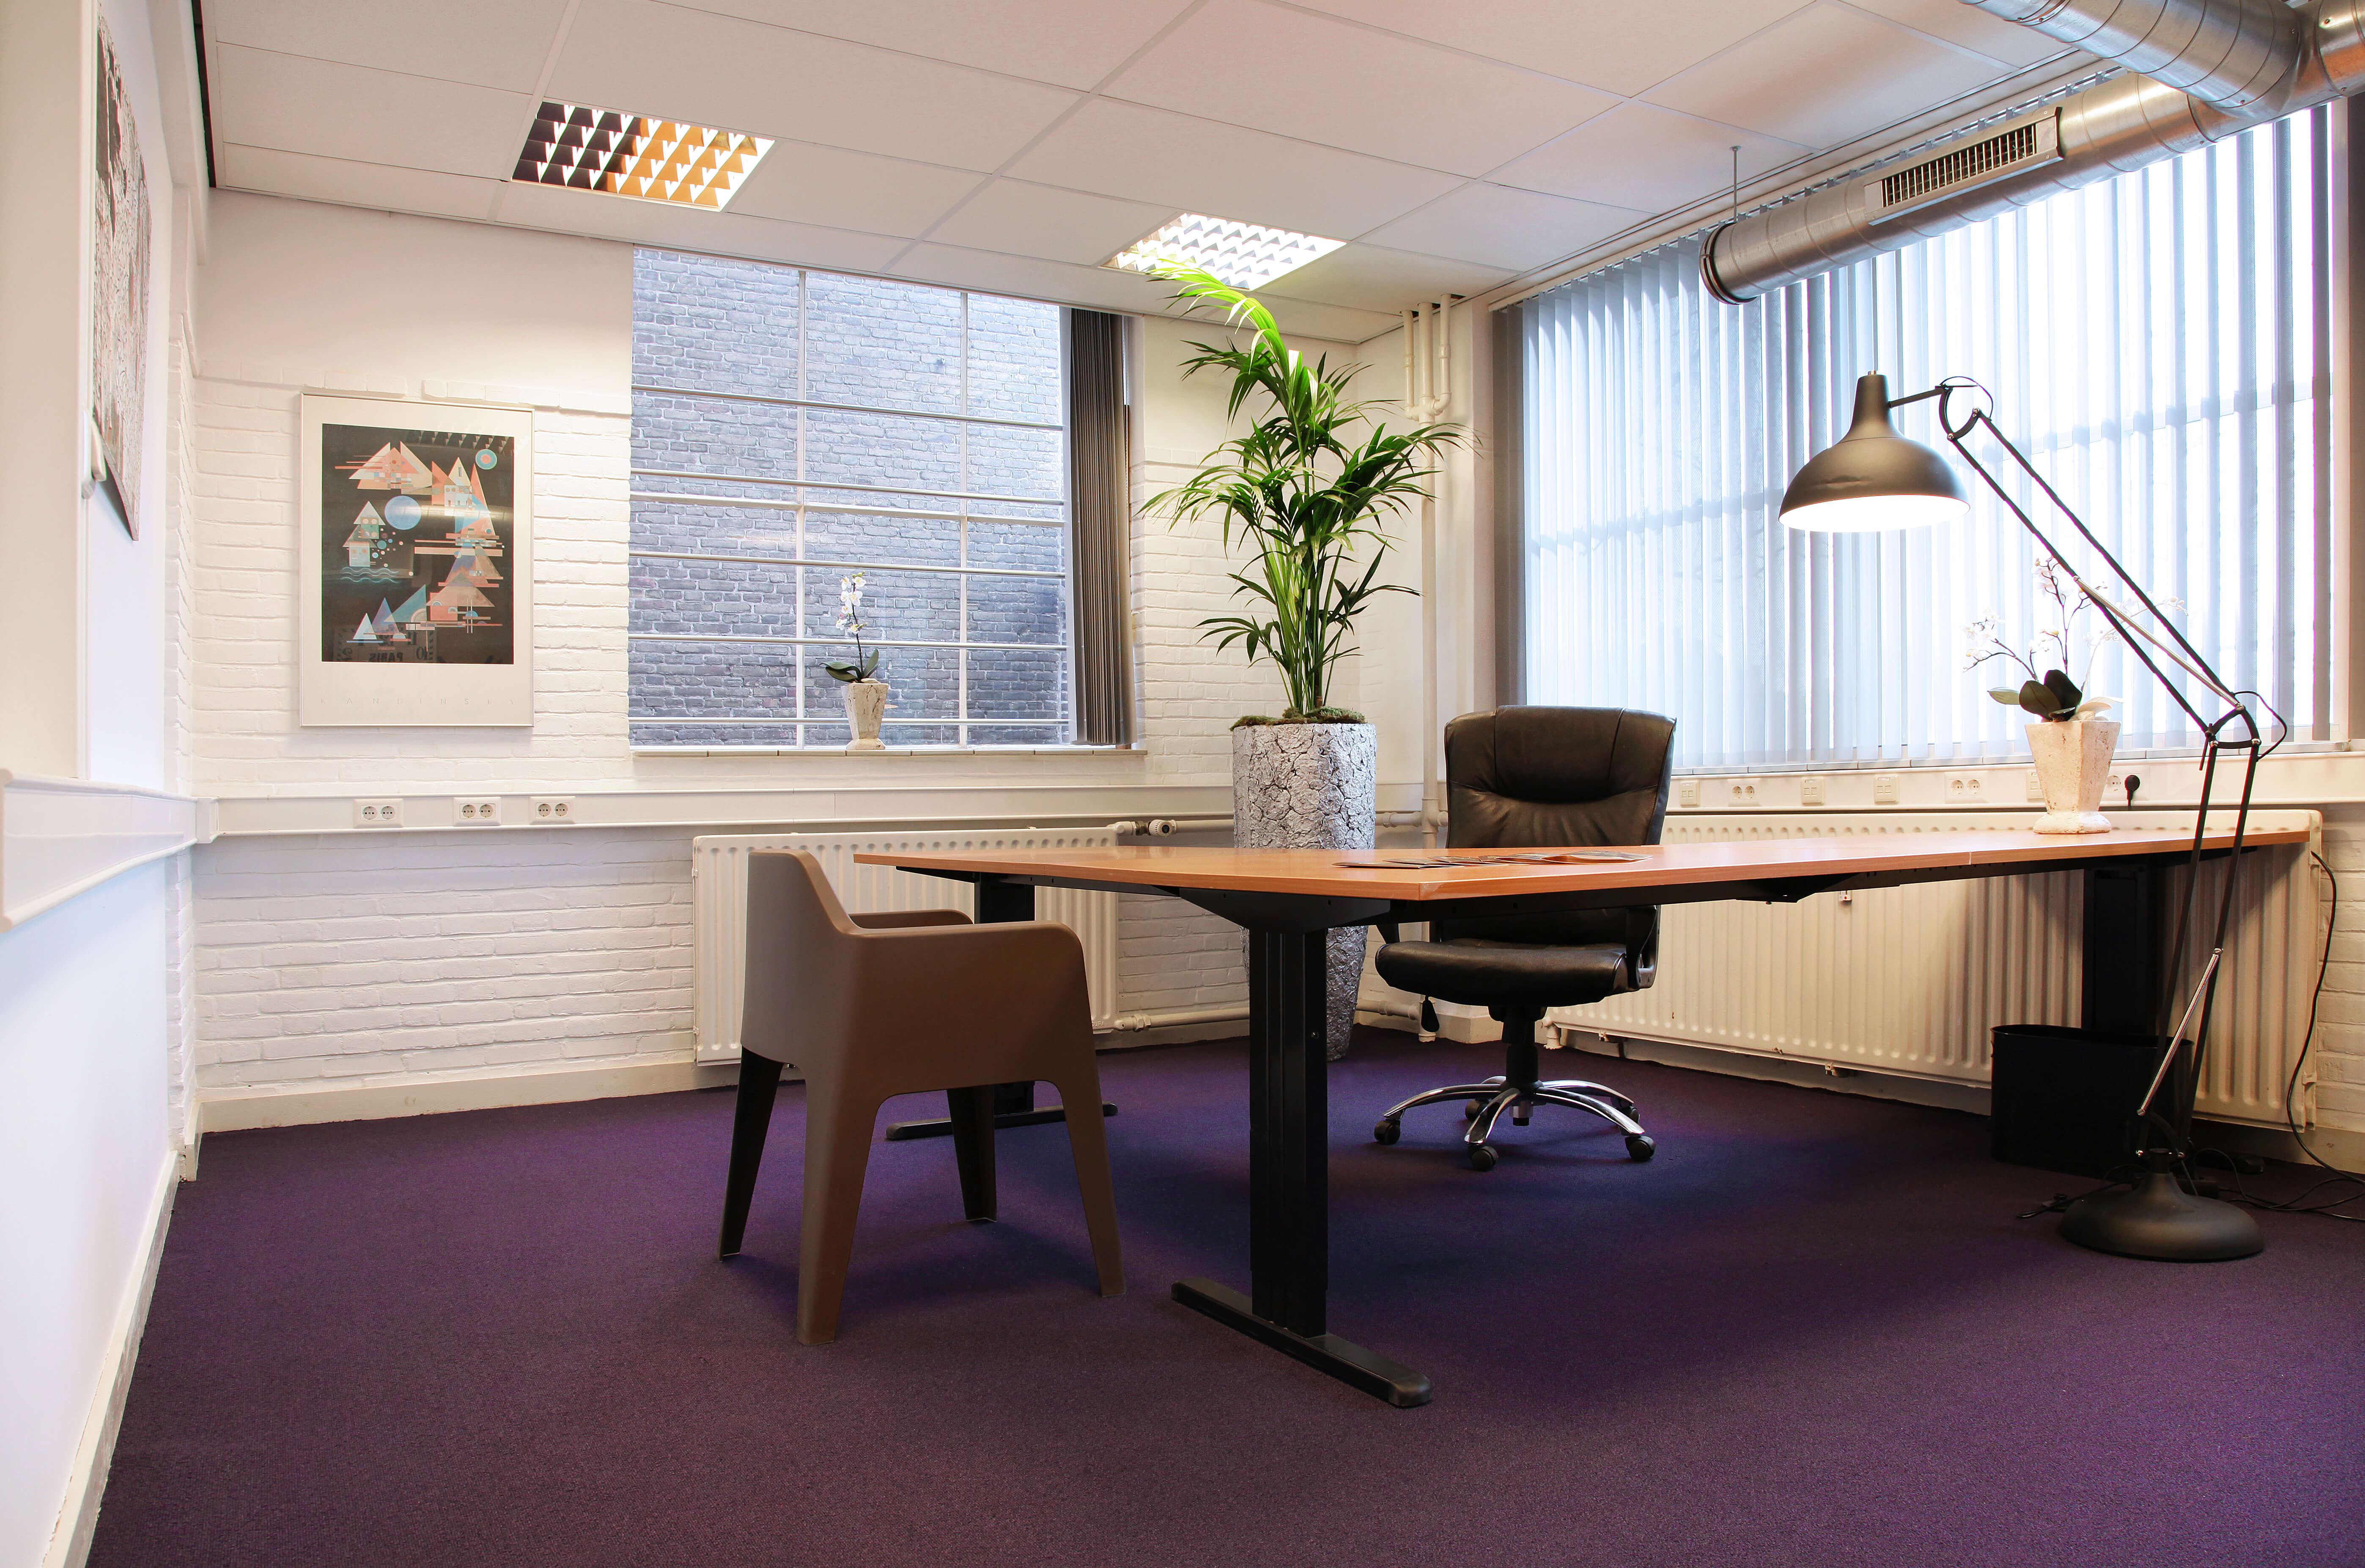 Bedrijfsunit huren in Leeuwarden - Emmastate - Emmakade 59